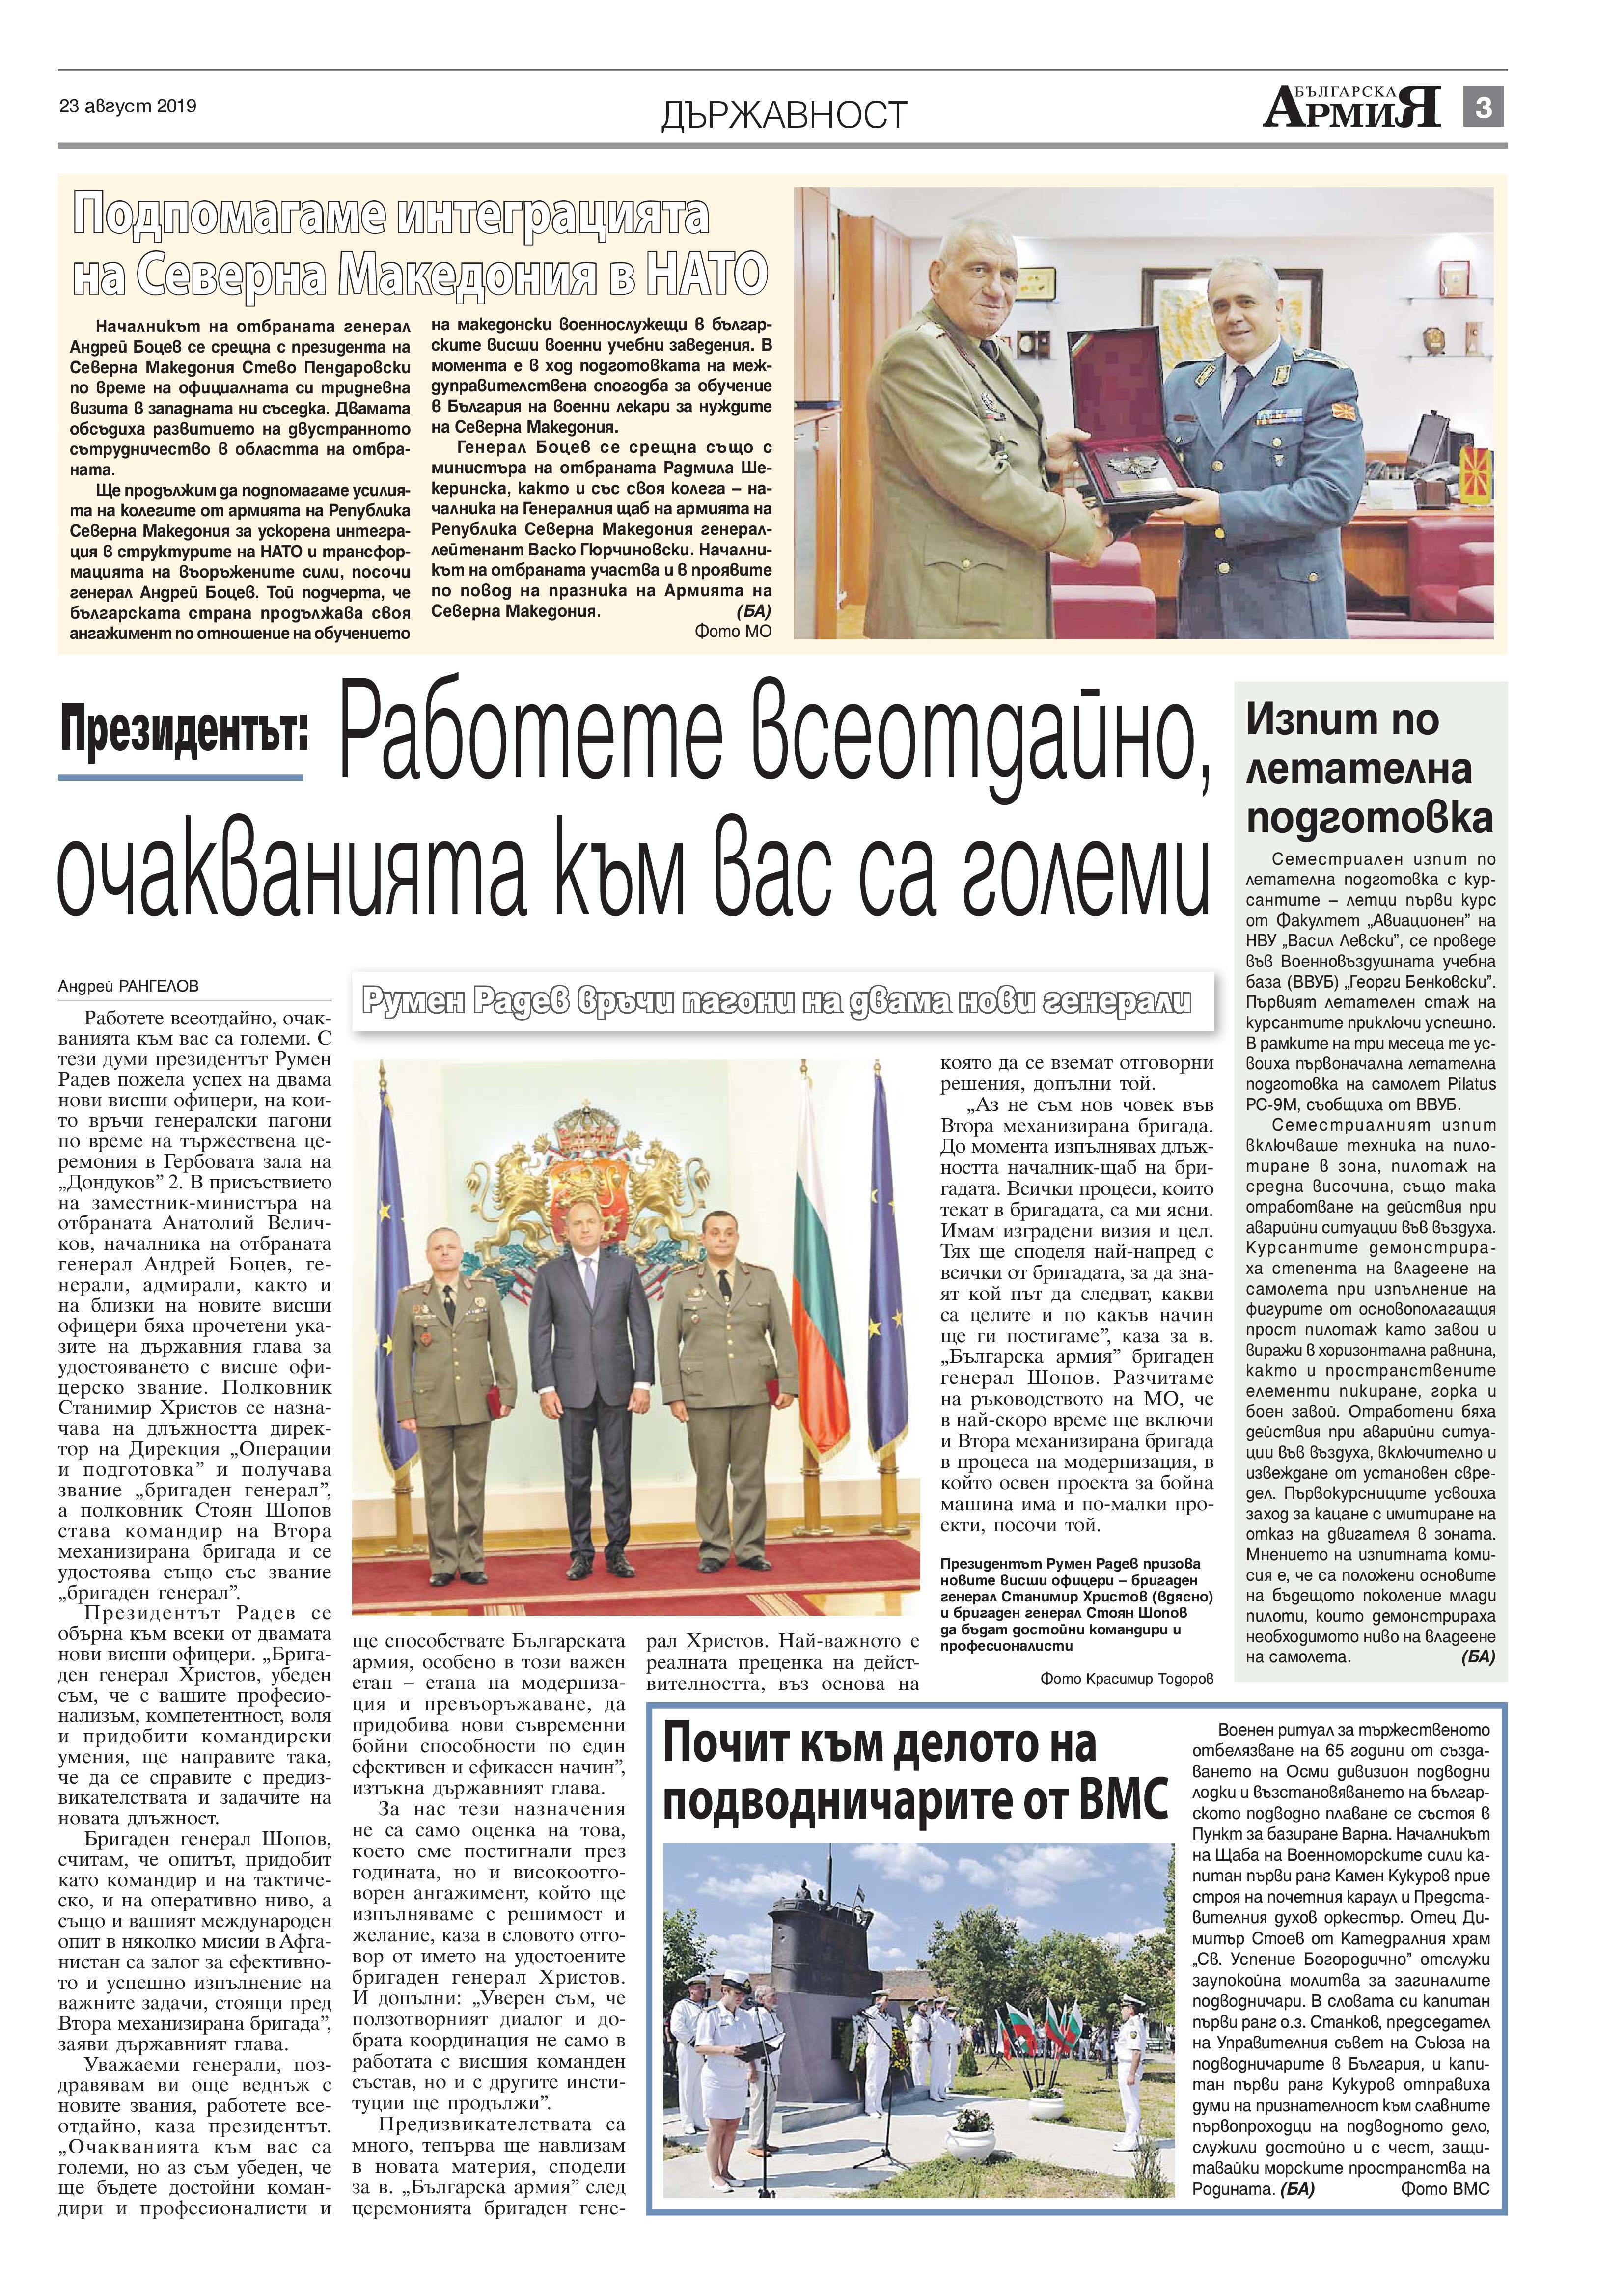 https://armymedia.bg/wp-content/uploads/2015/06/03-29.jpg